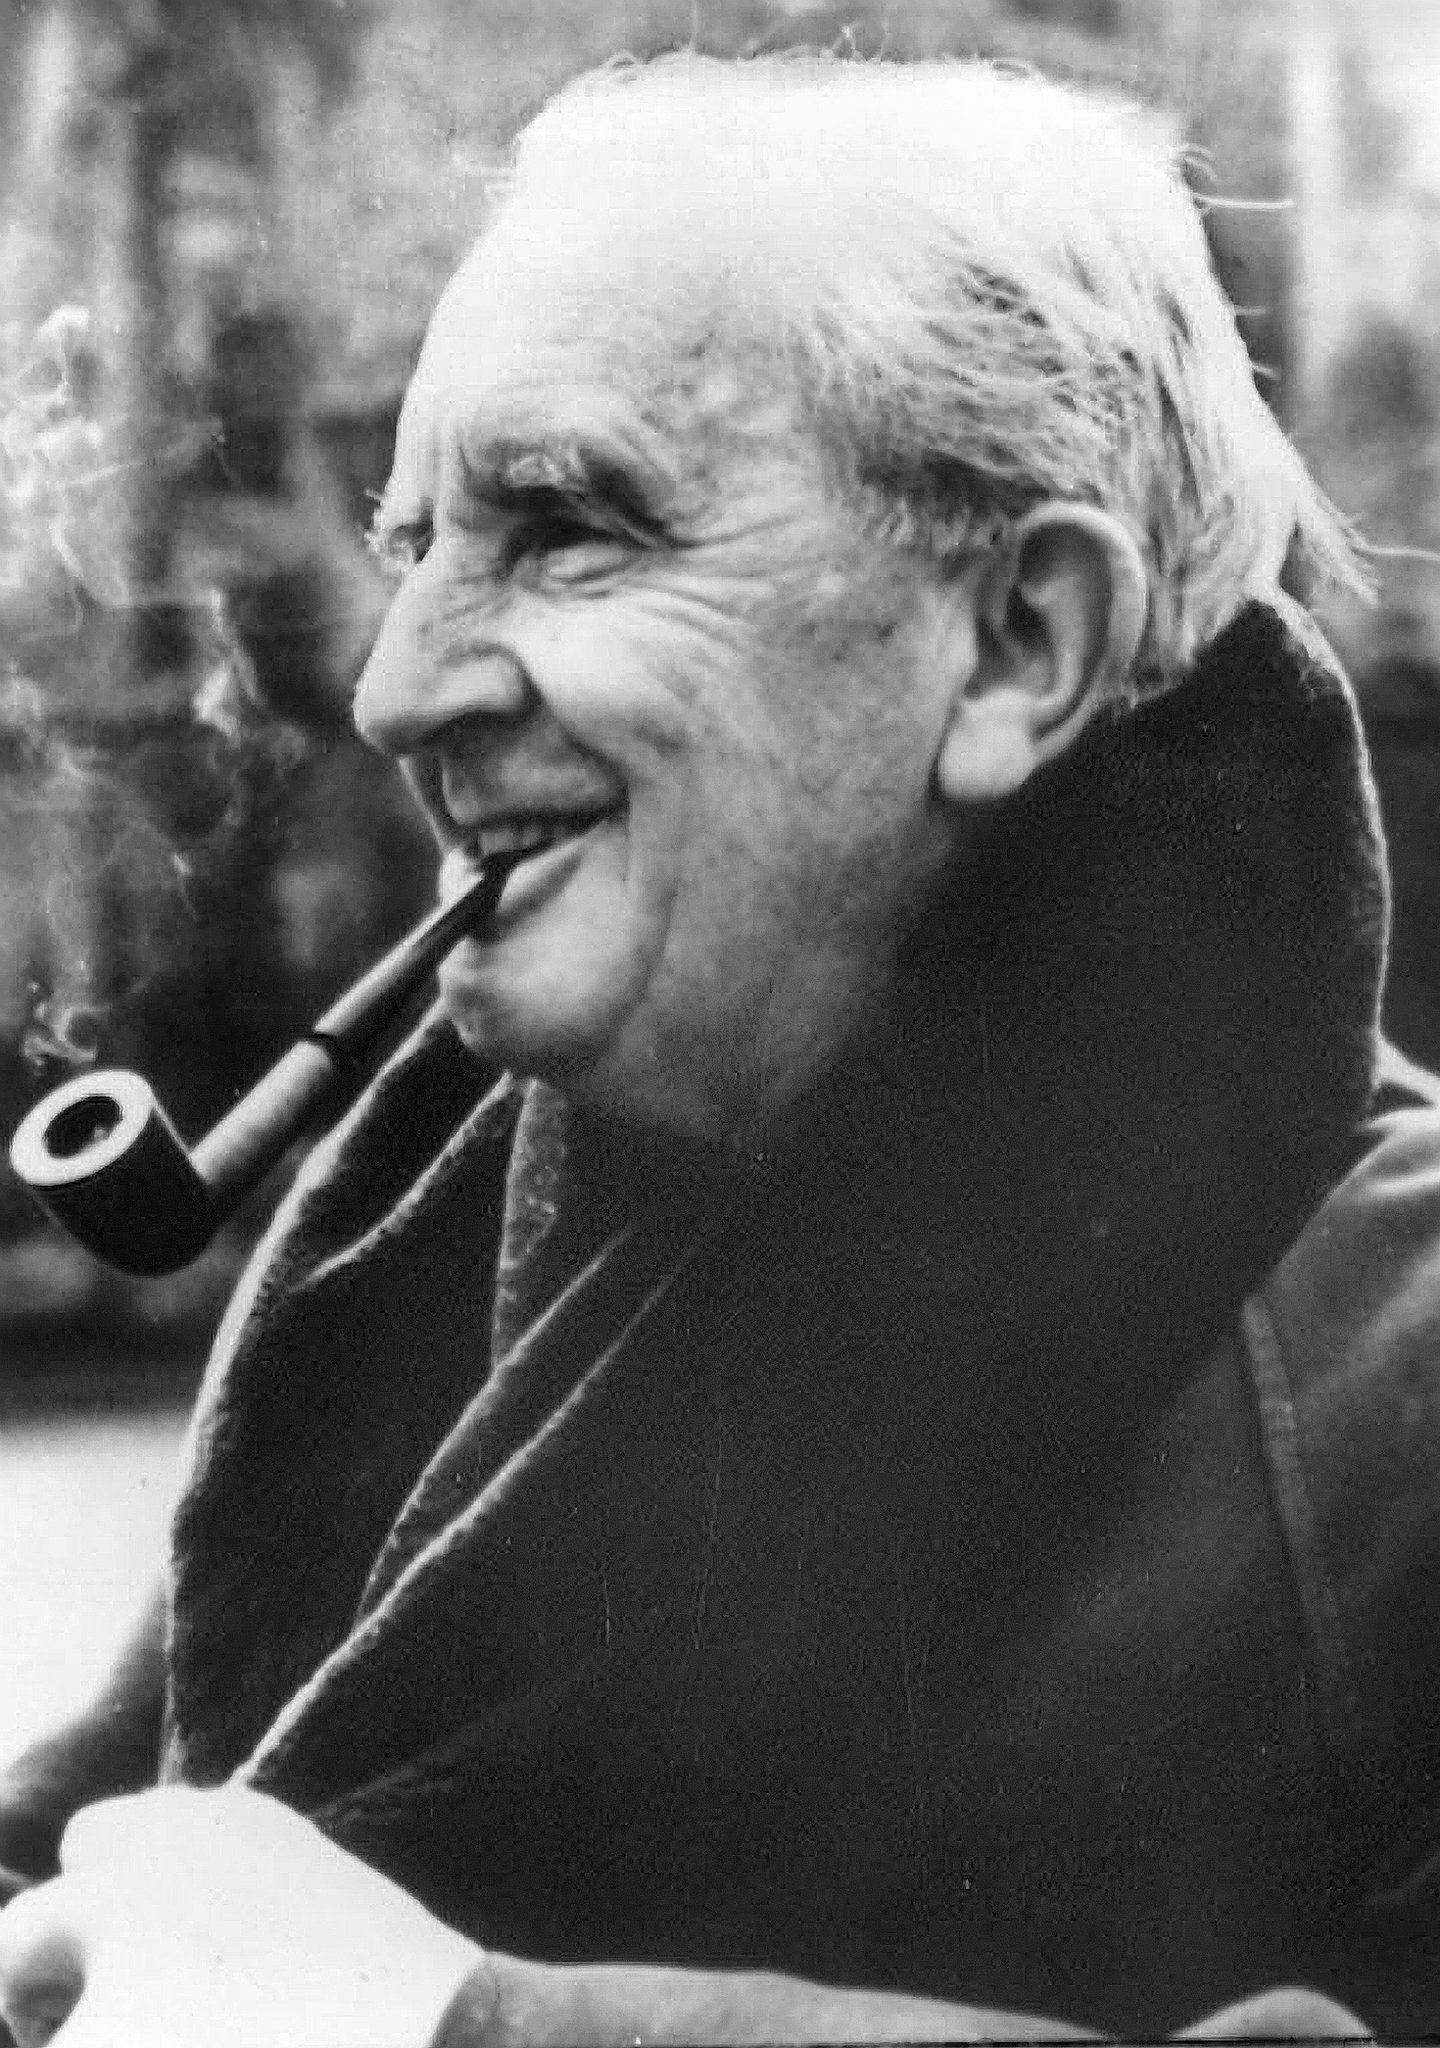 JRR. Tolkien